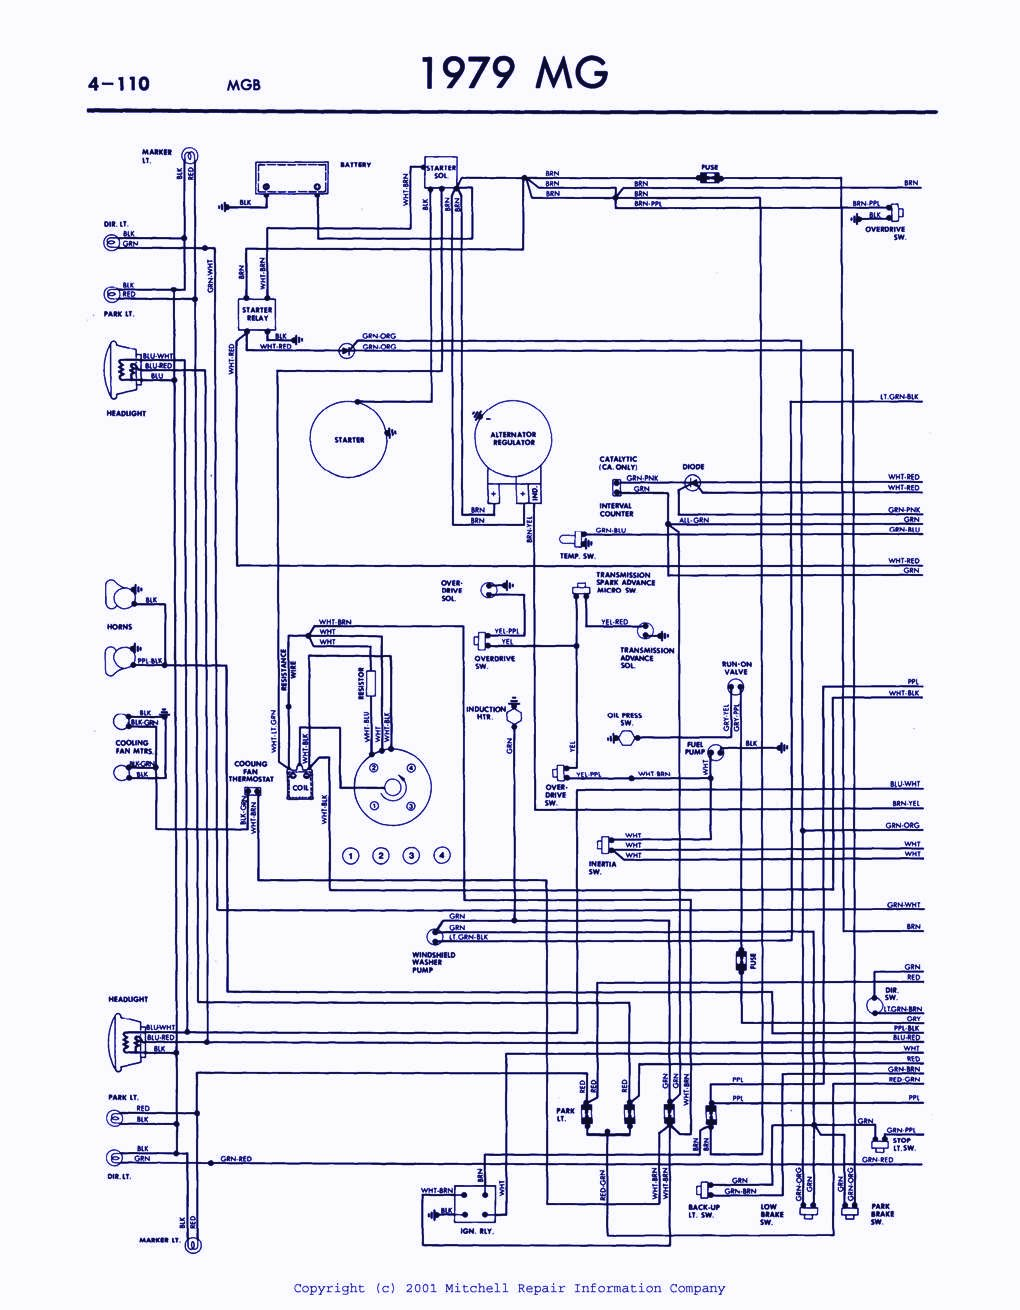 1979+MG+MGB+Wiring+Diagram mga wiring diagram somurich com